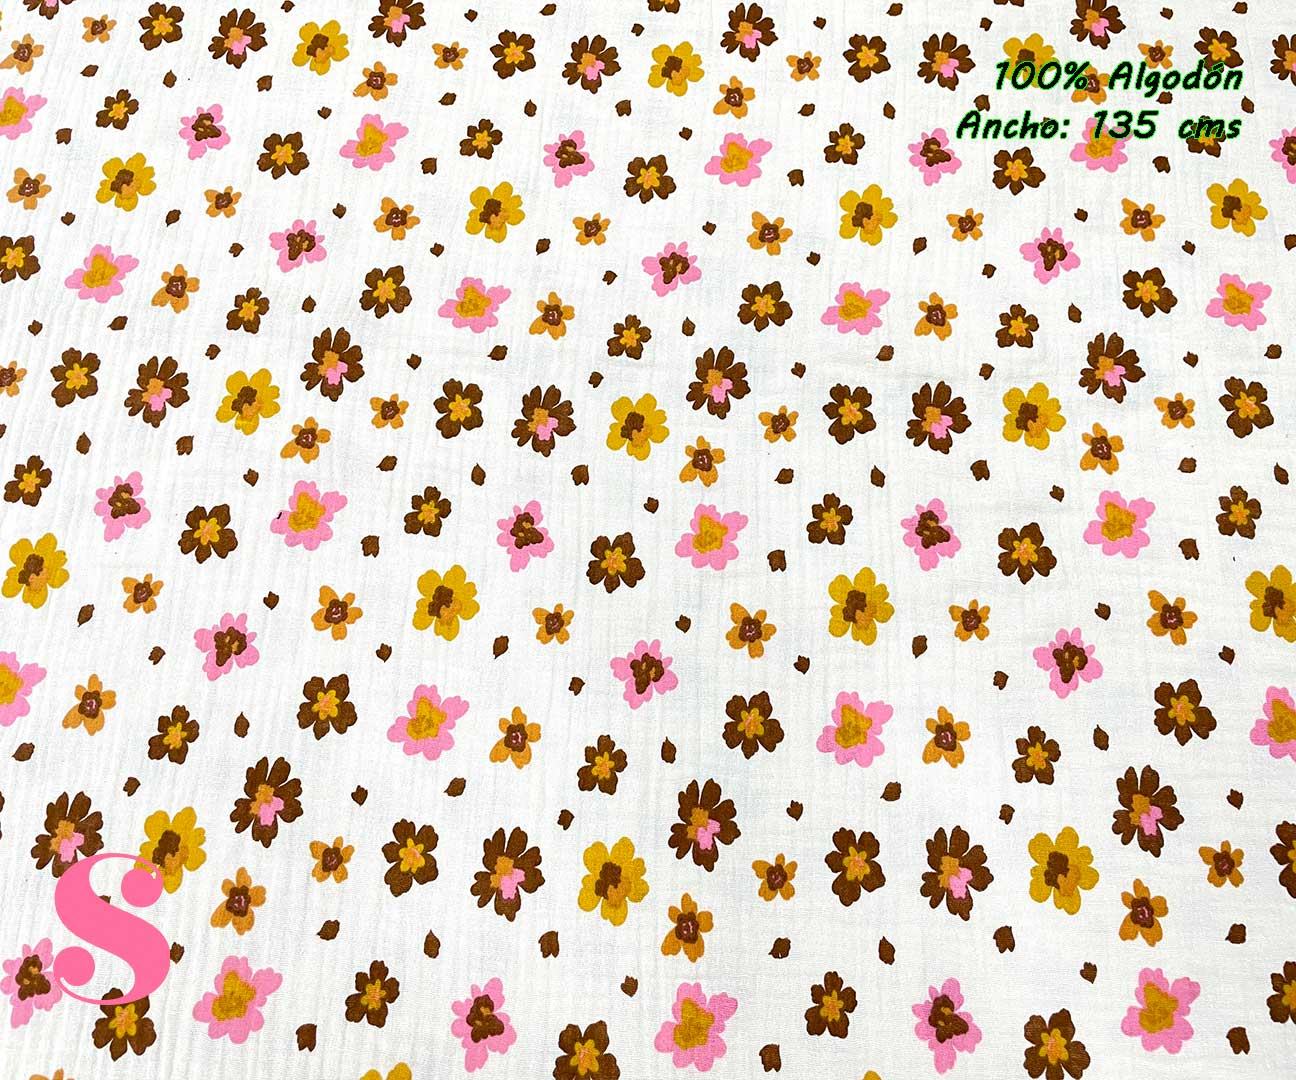 11-telas-de-primavera-infantiles,-estampados-infantiles-primaverales,-tela-arcoiris-de-algodón,tela-doble-gasa,Doble Gasa Muselina Florecitas